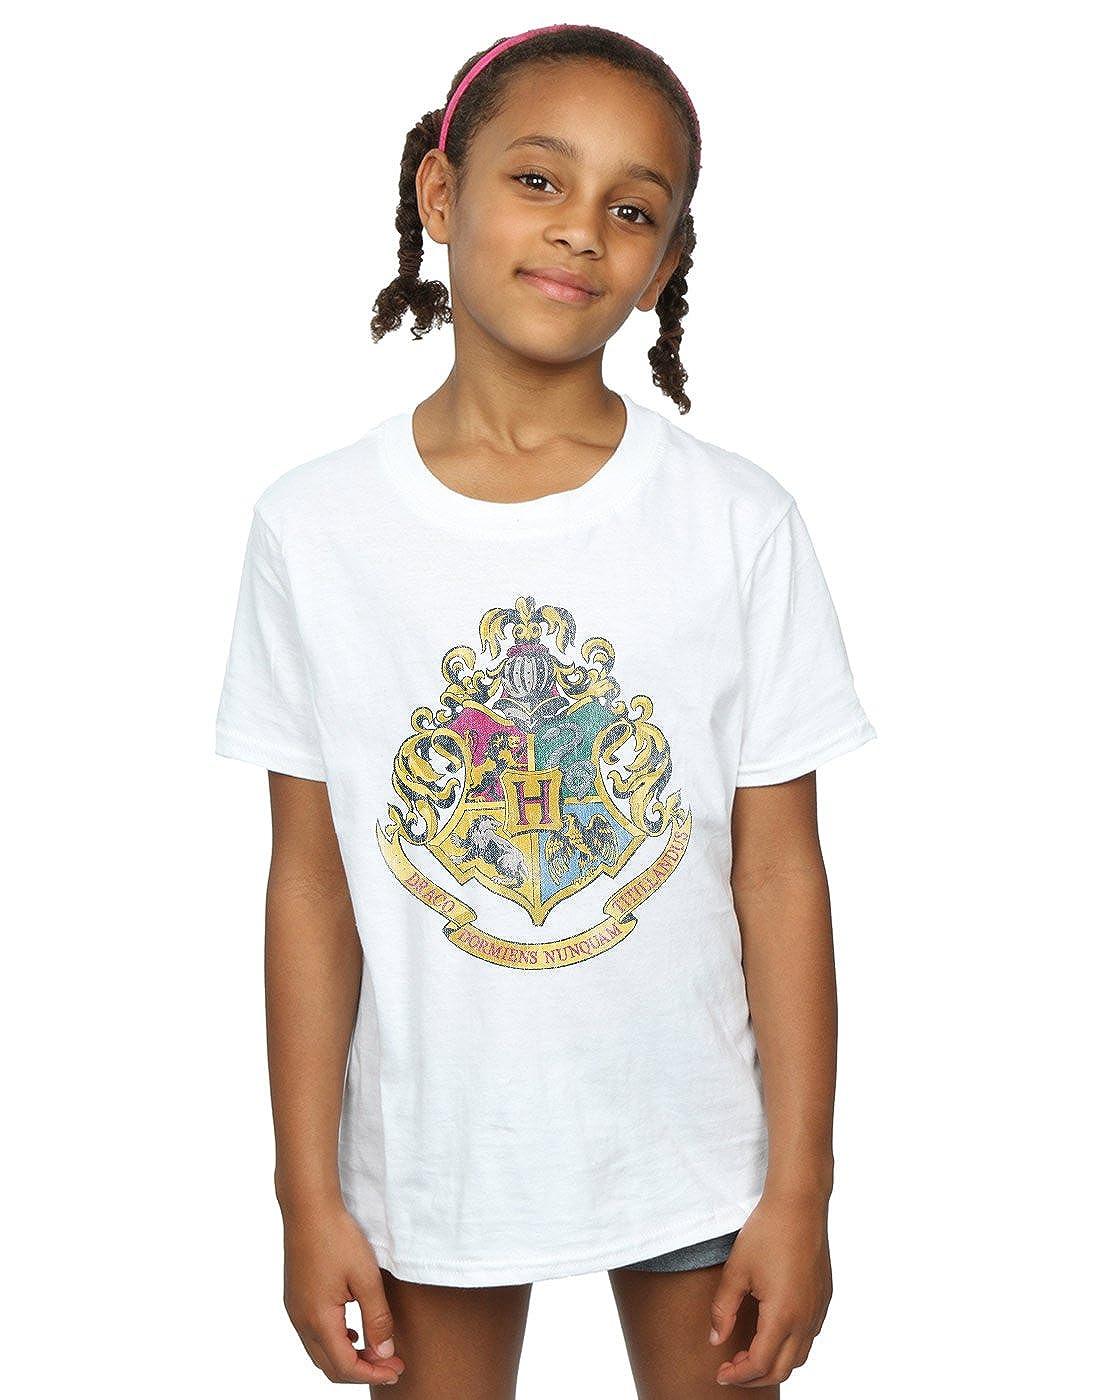 HARRY POTTER Girls Hogwarts Distressed Crest T-Shirt Absolute Cult